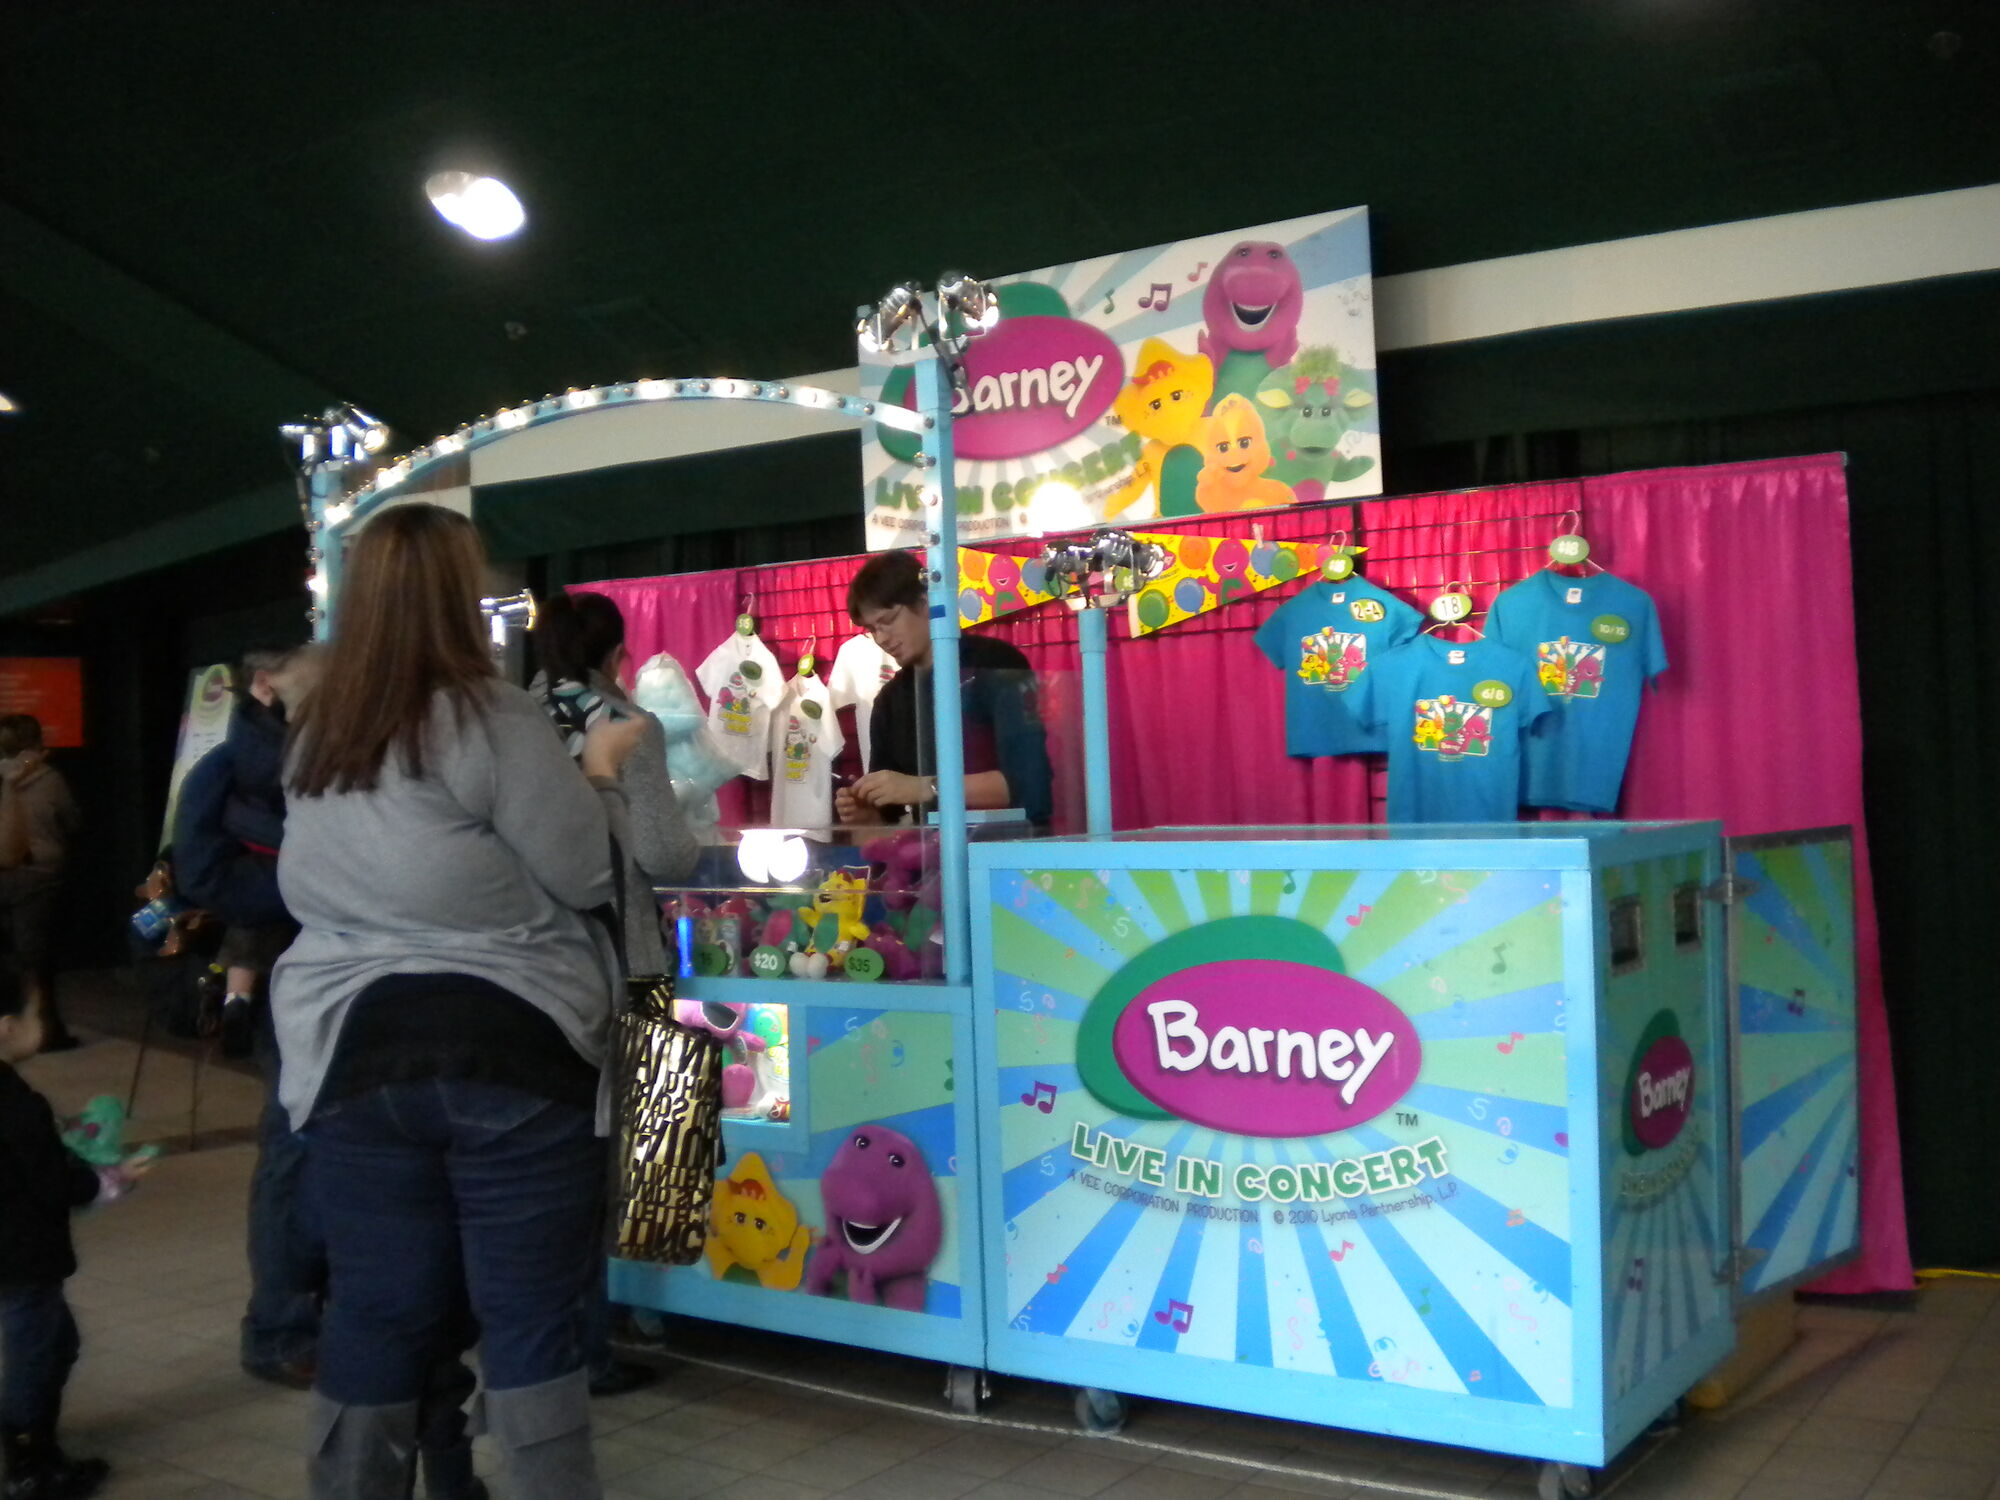 Barney Live In Concert Birthday Bash Barney Wiki FANDOM - Barney live in concert birthday